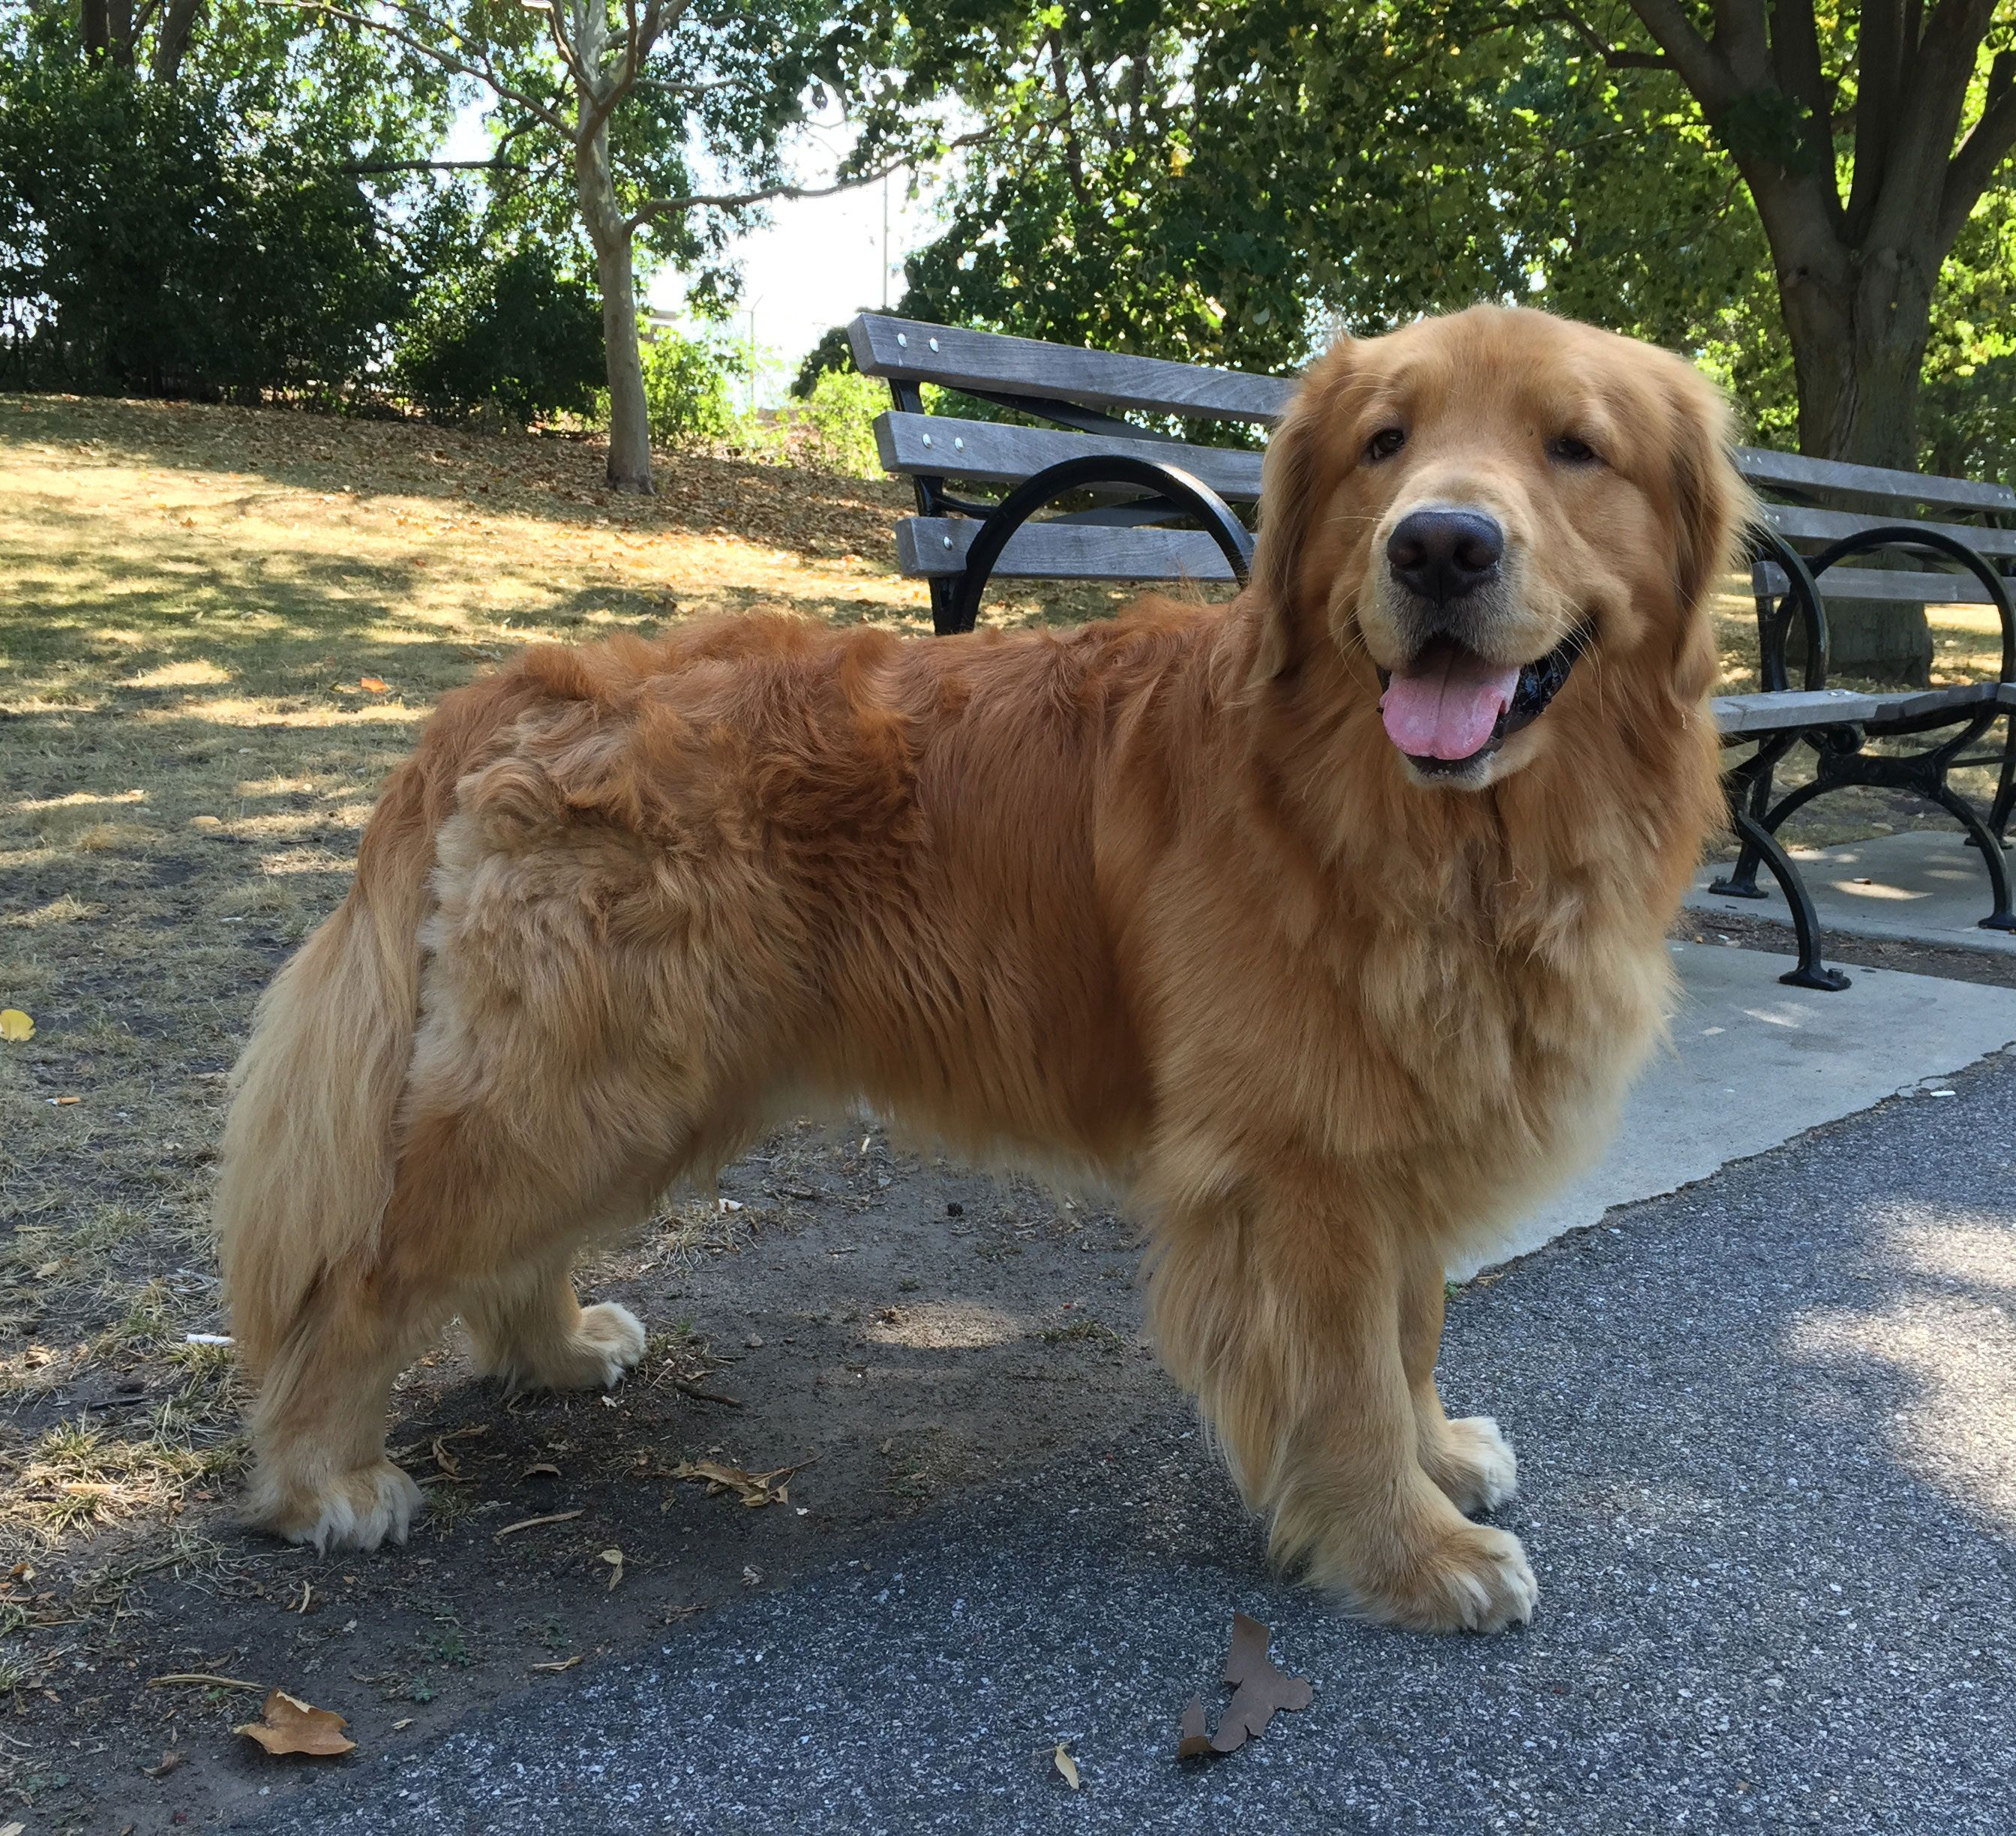 Majestic 2 Year Old Golden Retriever Dog Dogs Golden Retriever